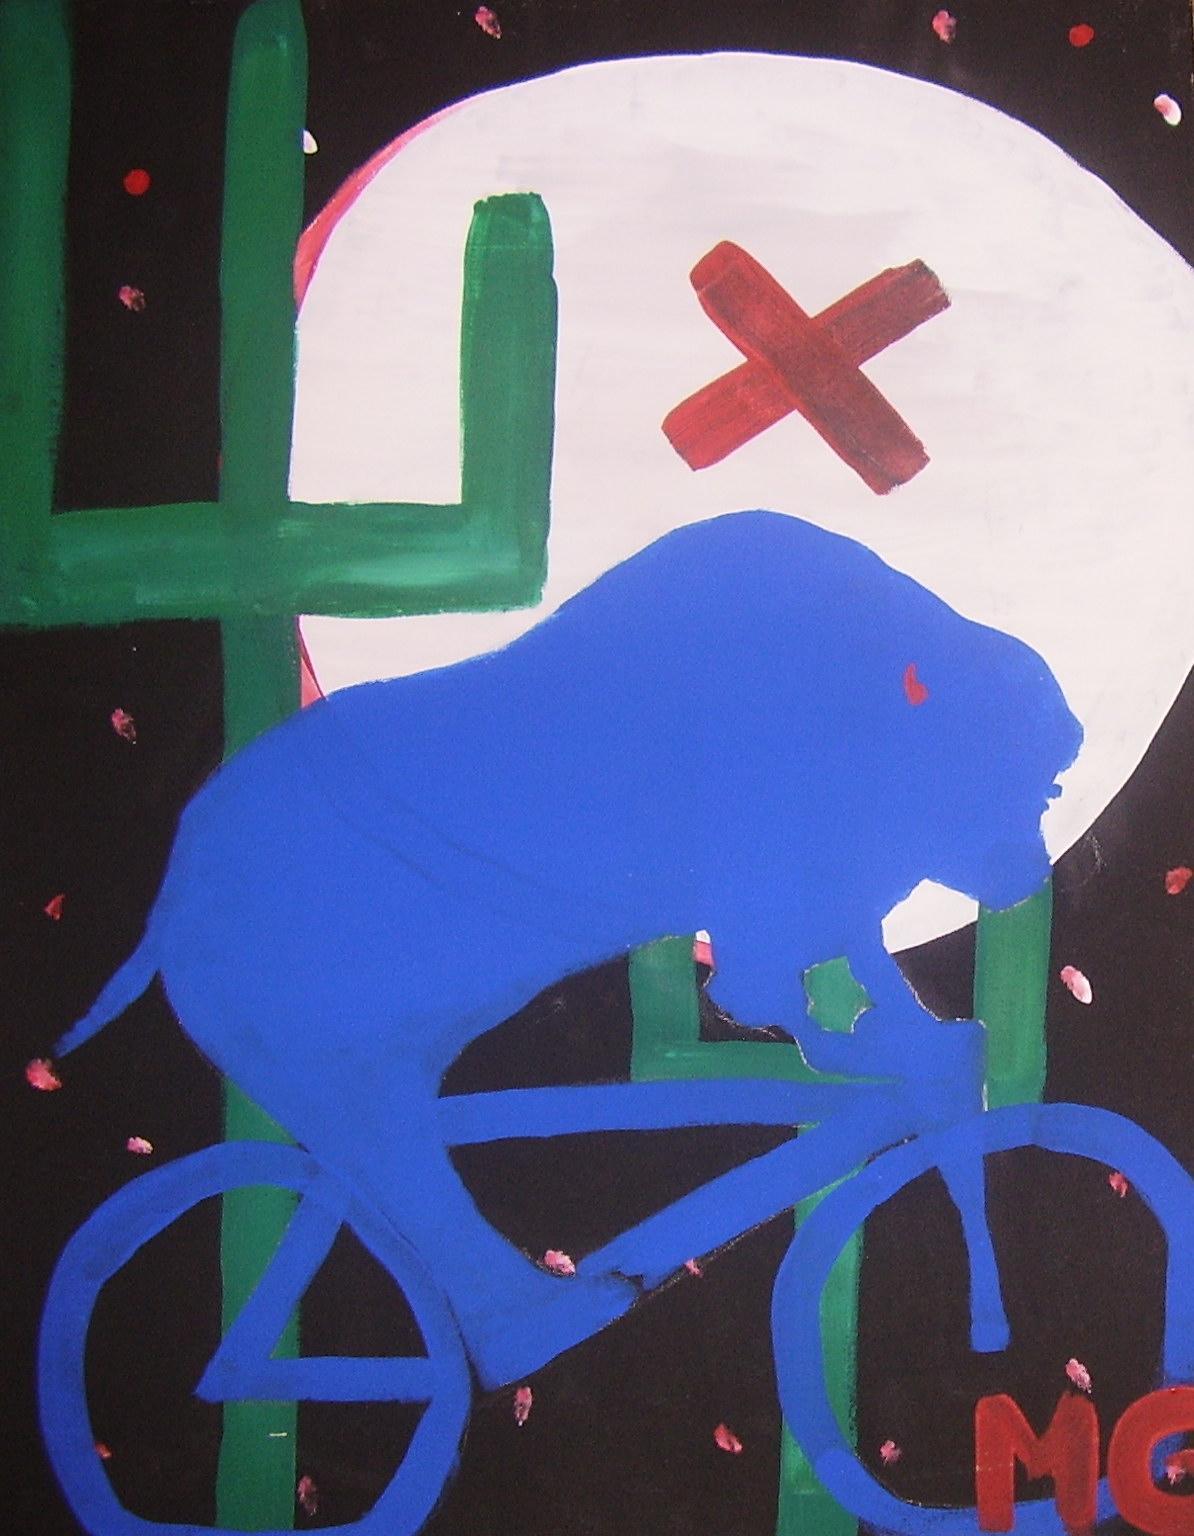 Bull riding bike